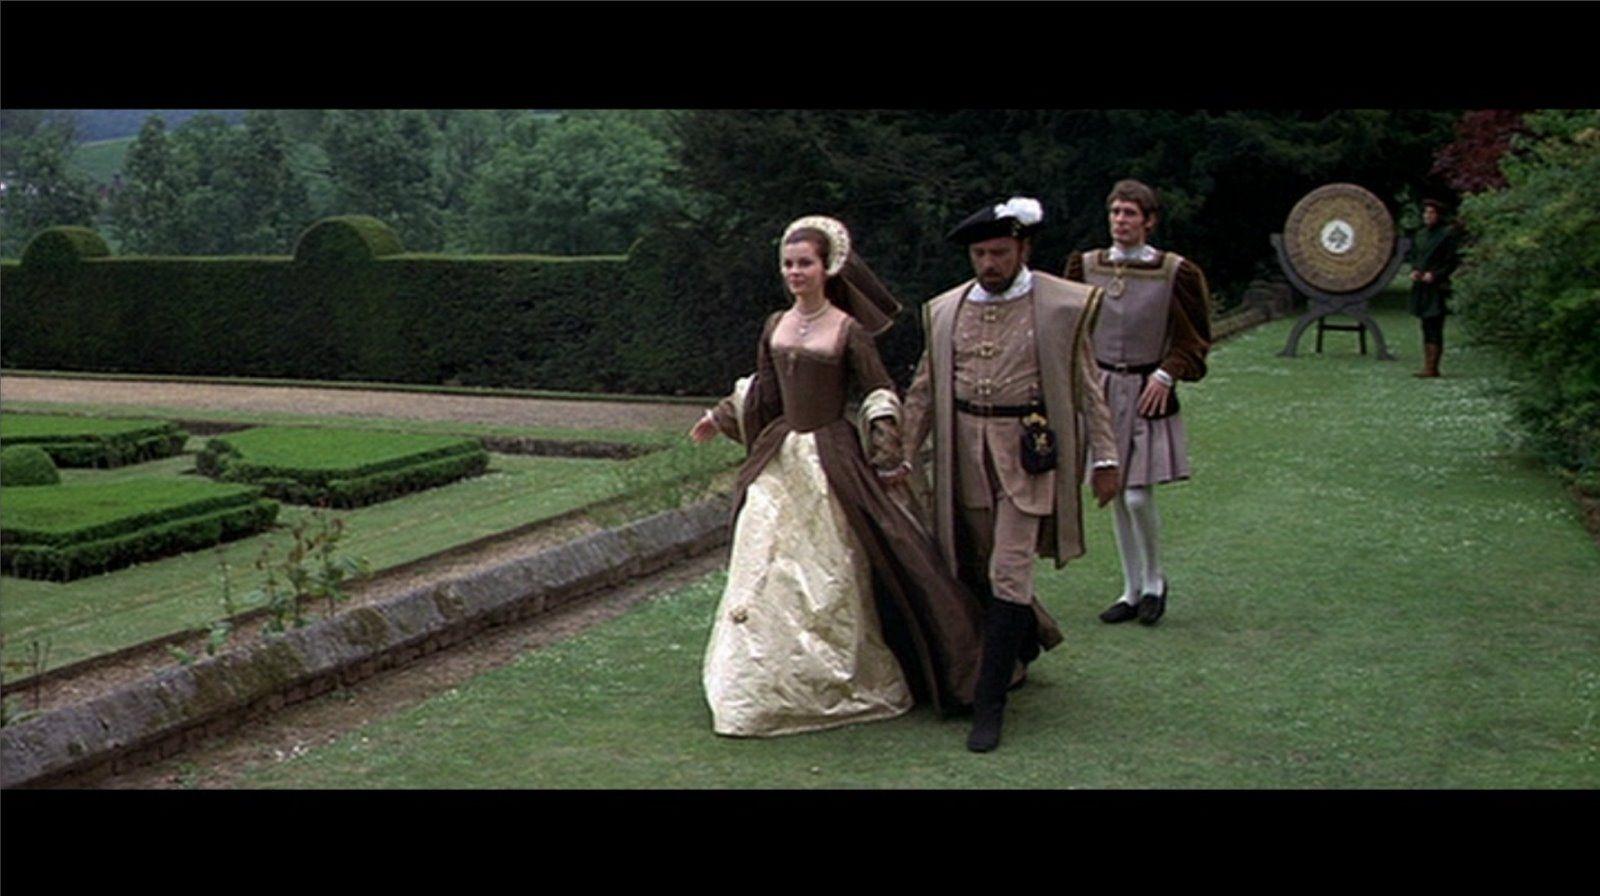 Anne of the Thousand Days (1969) Anne Boleyn - Love this gown.